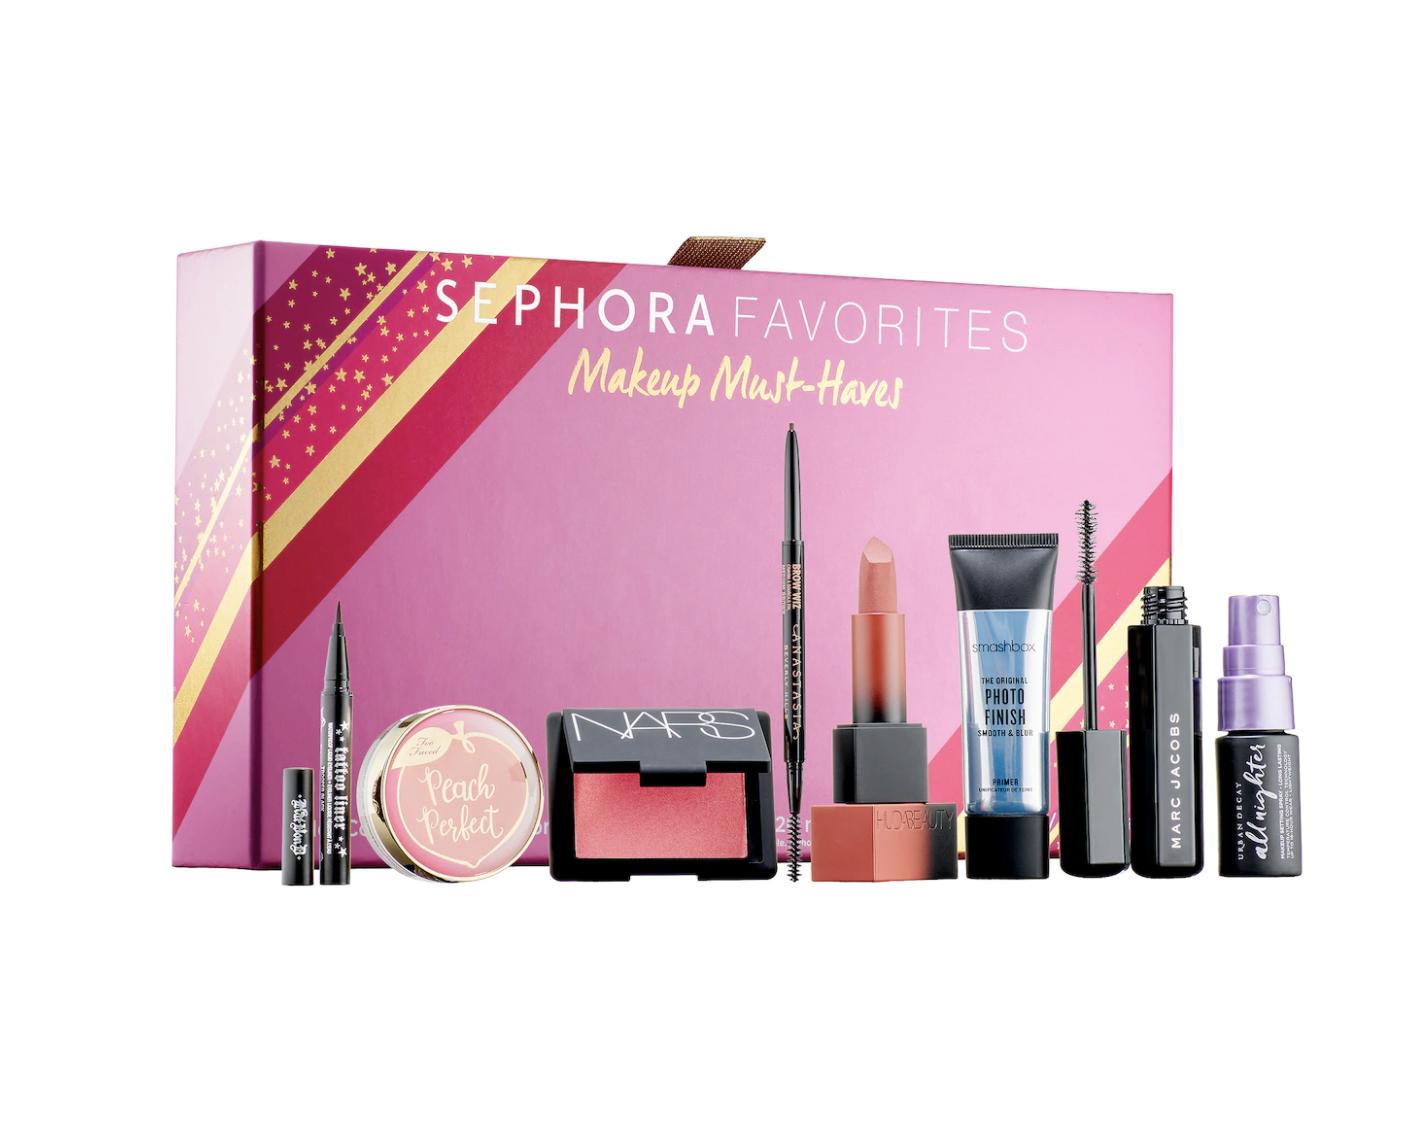 sephora makeup favorites set, gifts for makeup lovers